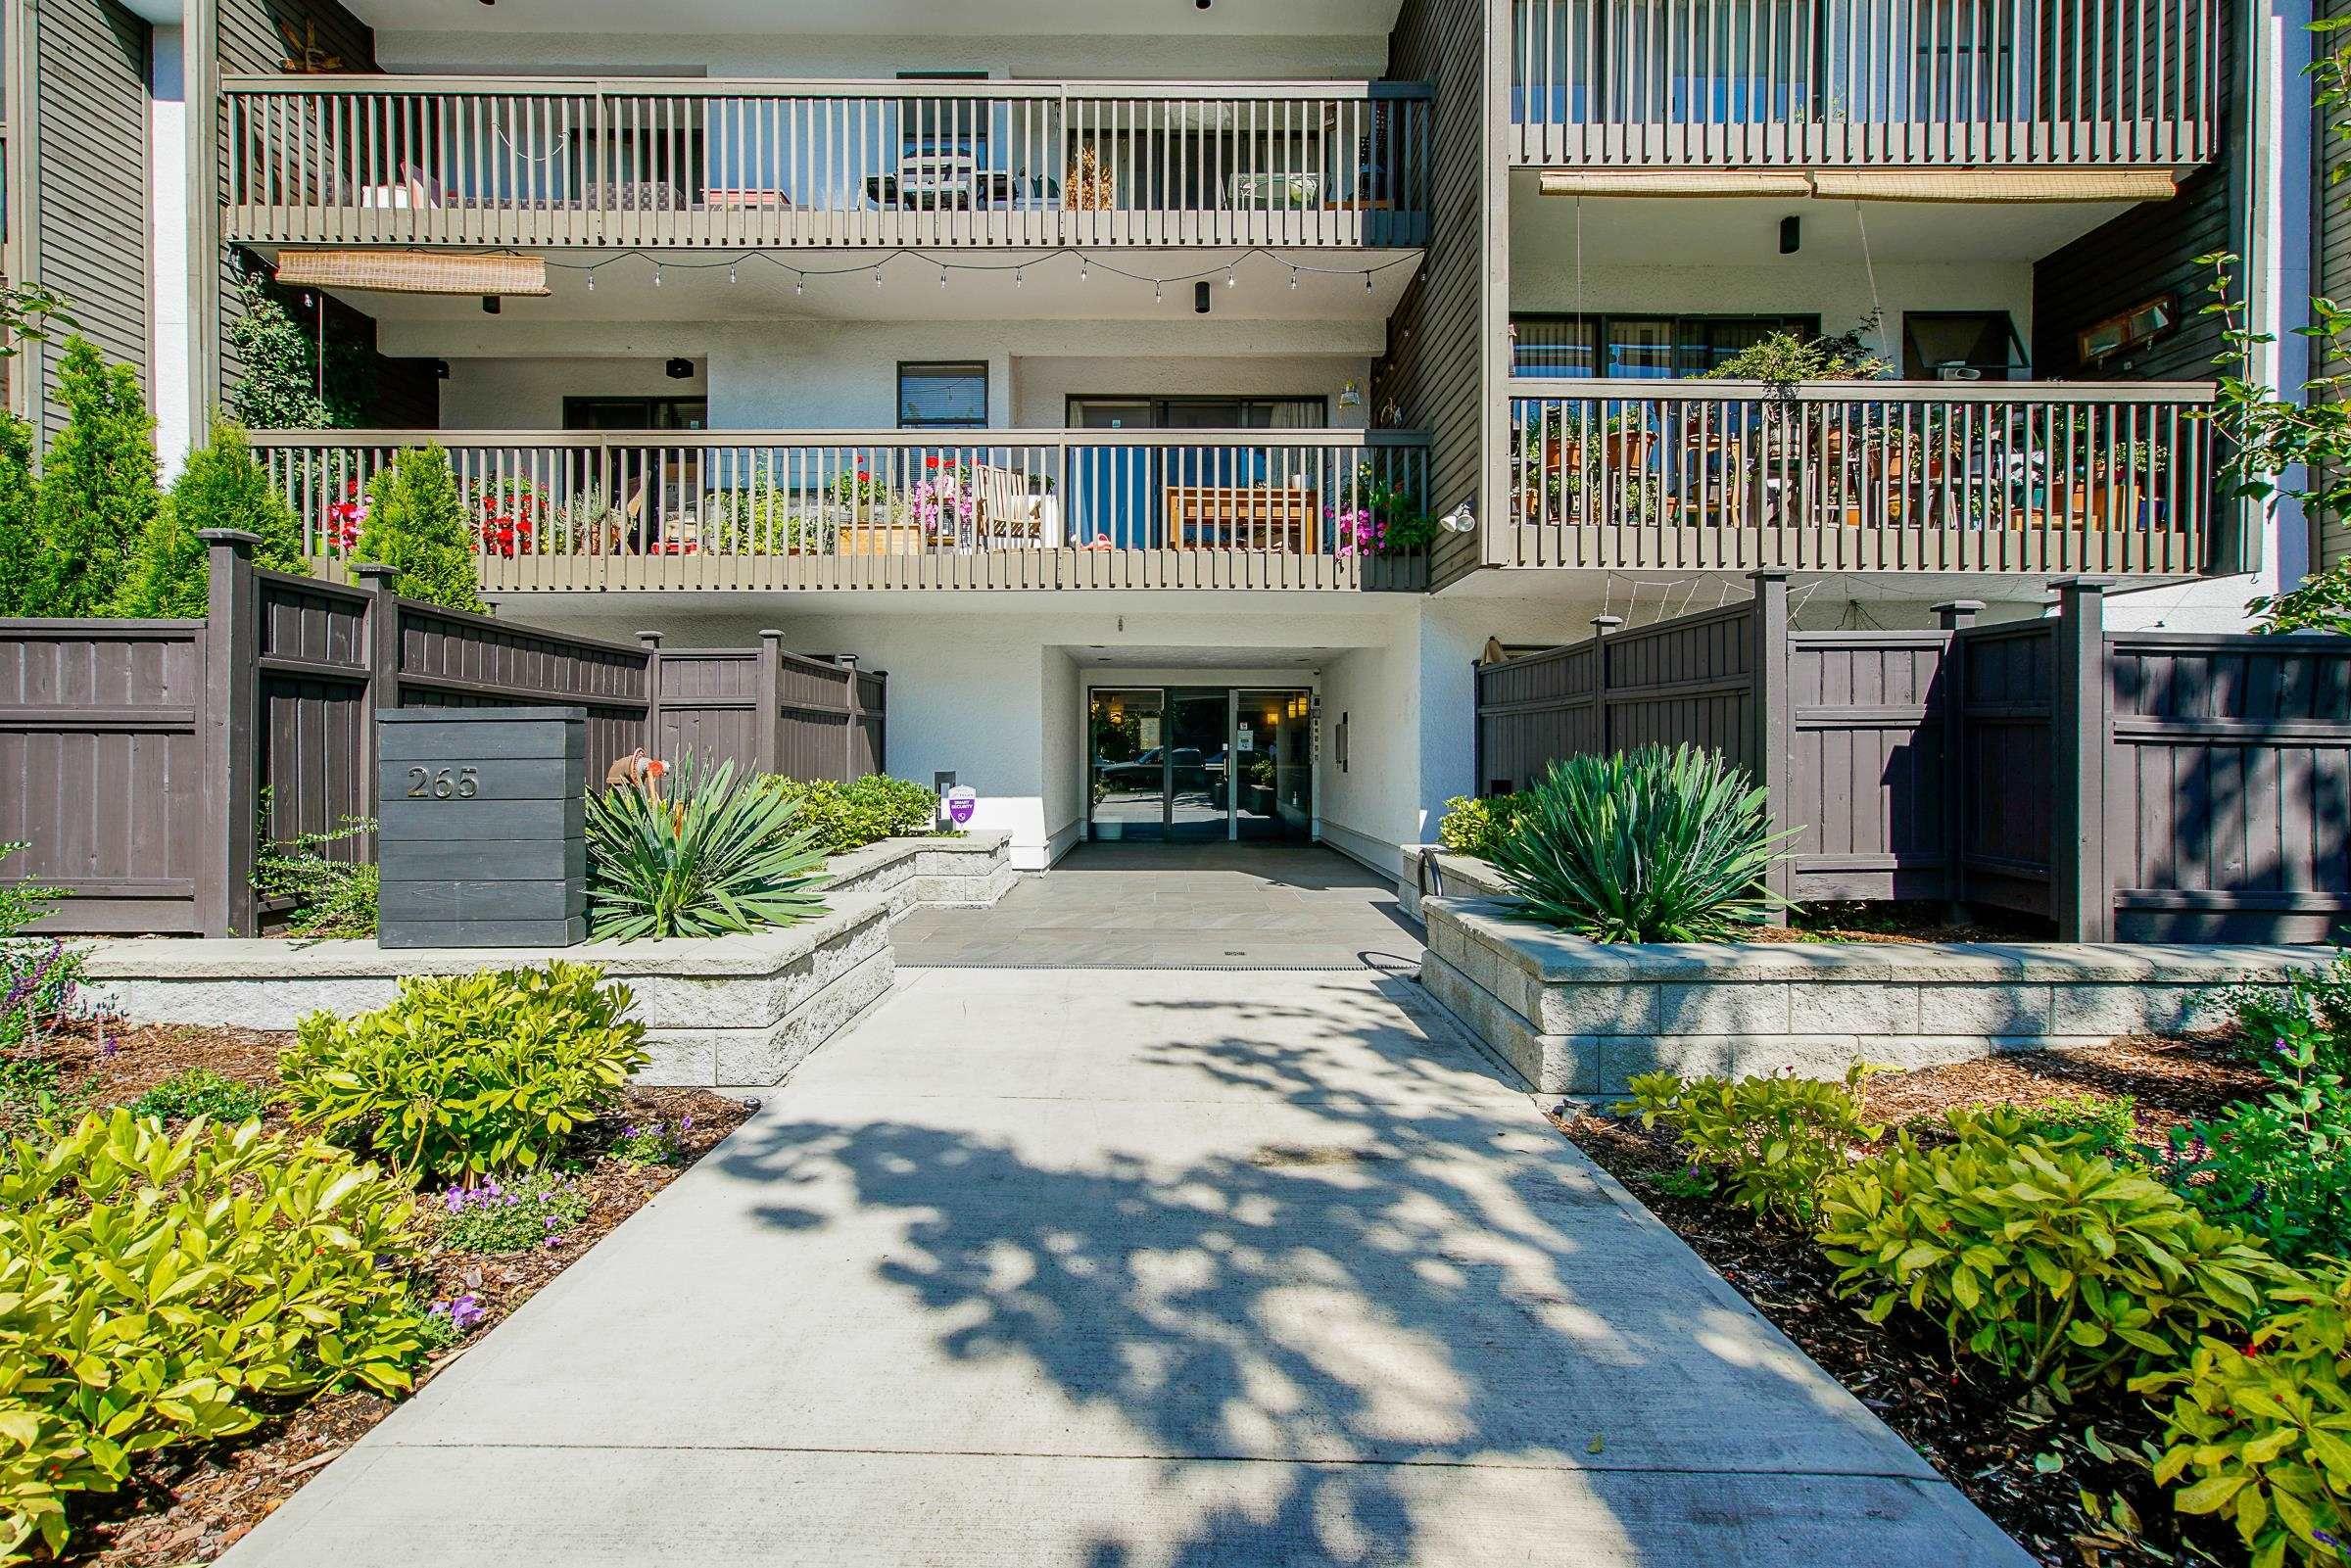 "Main Photo: 115 265 E 15TH Avenue in Vancouver: Mount Pleasant VE Condo for sale in ""Woodglen"" (Vancouver East)  : MLS®# R2616900"